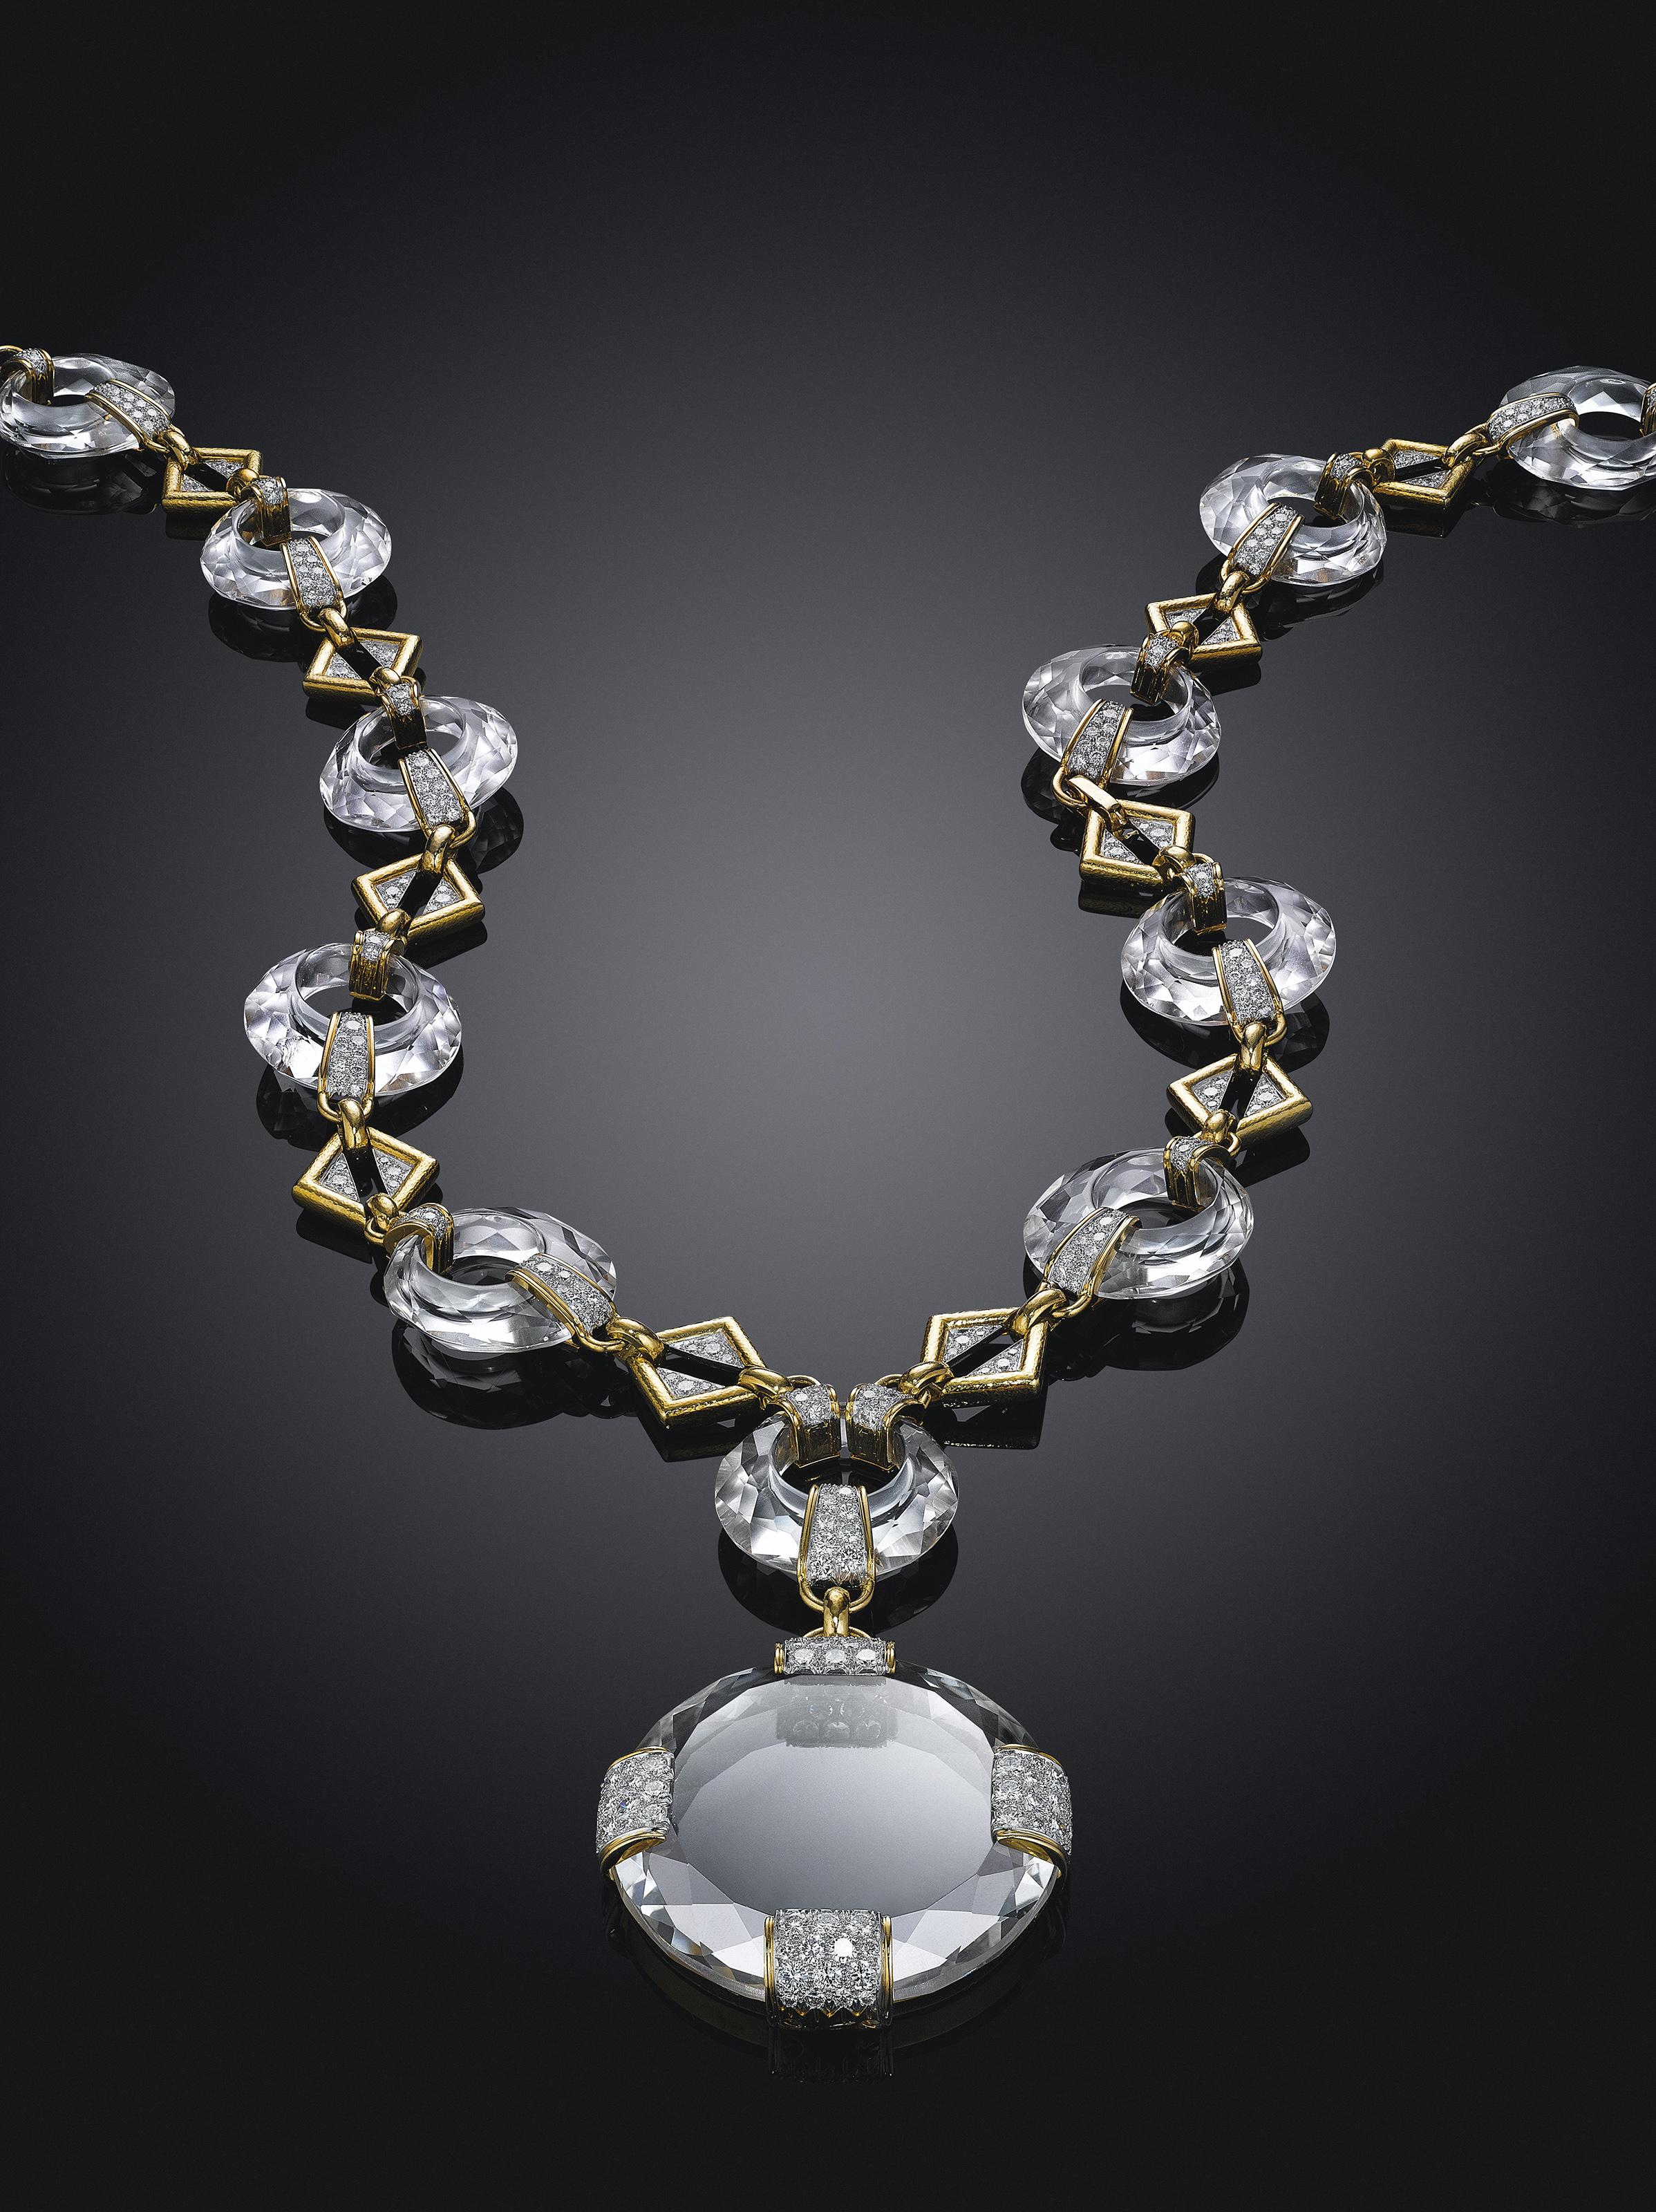 A ROCK CRYSTAL, DIAMOND AND GOLD SAUTOIR, BY DAVID WEBB